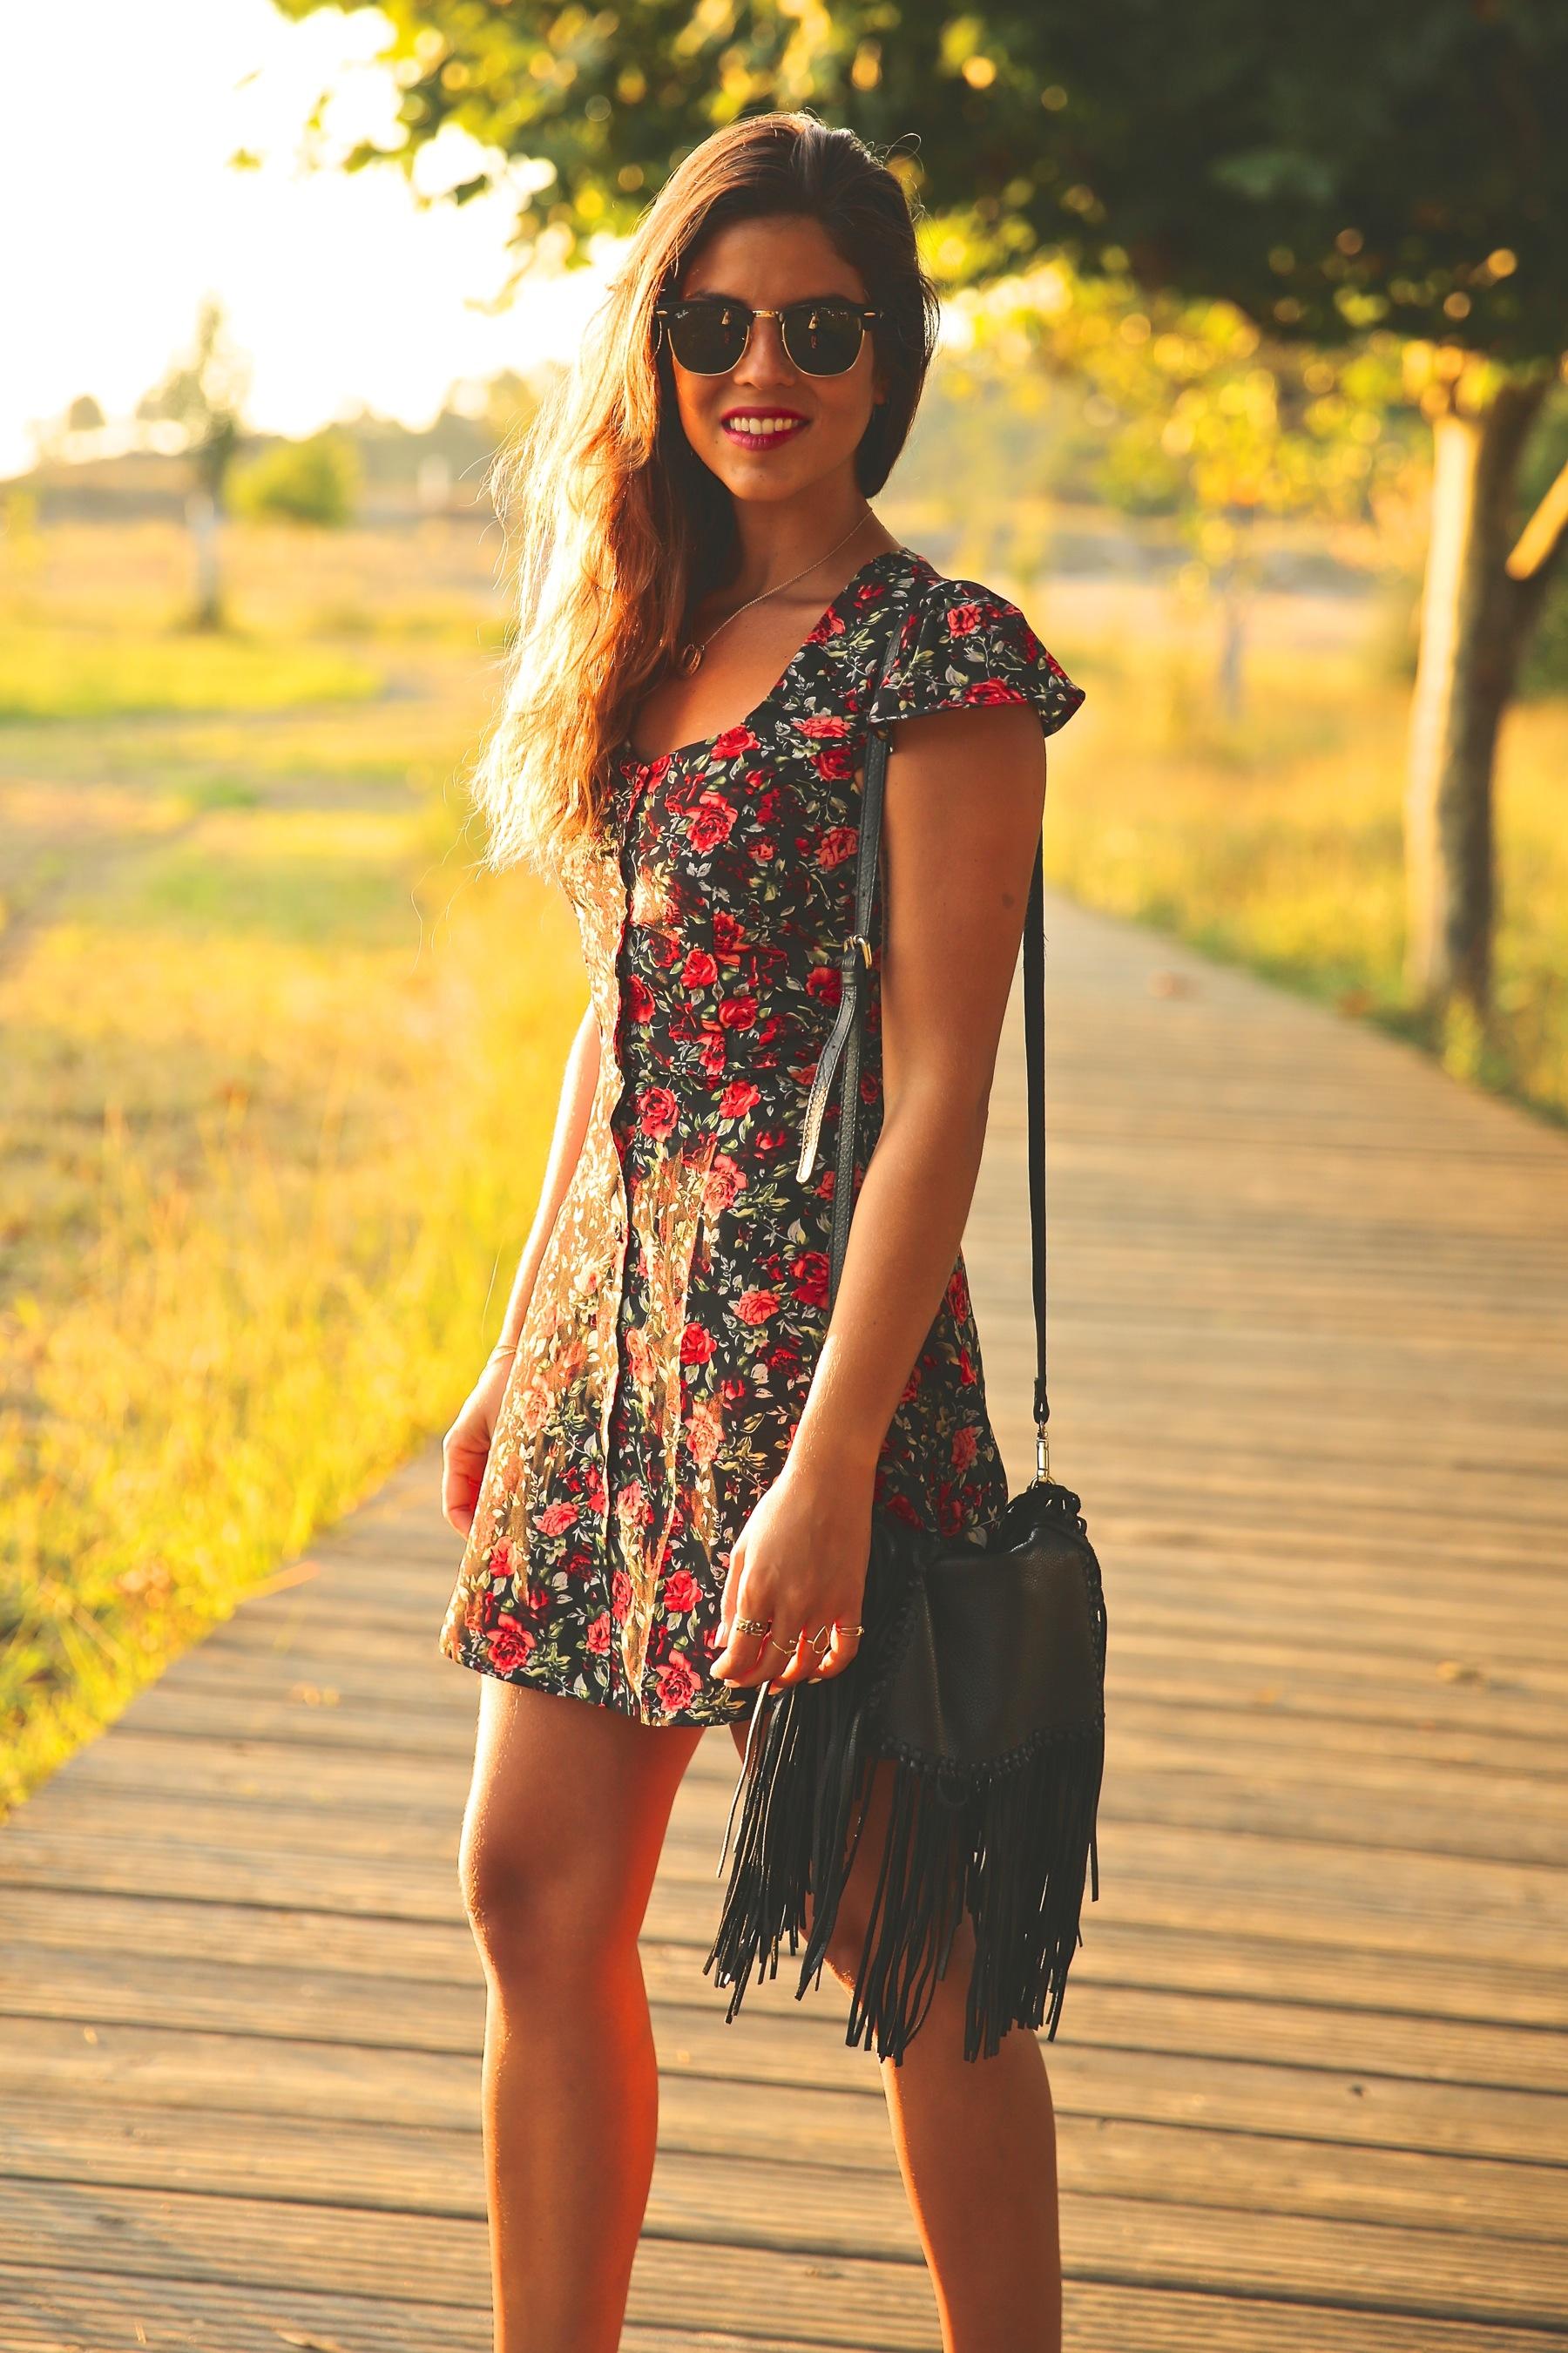 trendy_taste-look-outfit-street_style-ootd-blog-blogger-fashion_spain-moda_españa-flower_print-dress-vestido-flores-sandalias_negras-black_sandals-platforms-sunset-playa-beach-summer-9